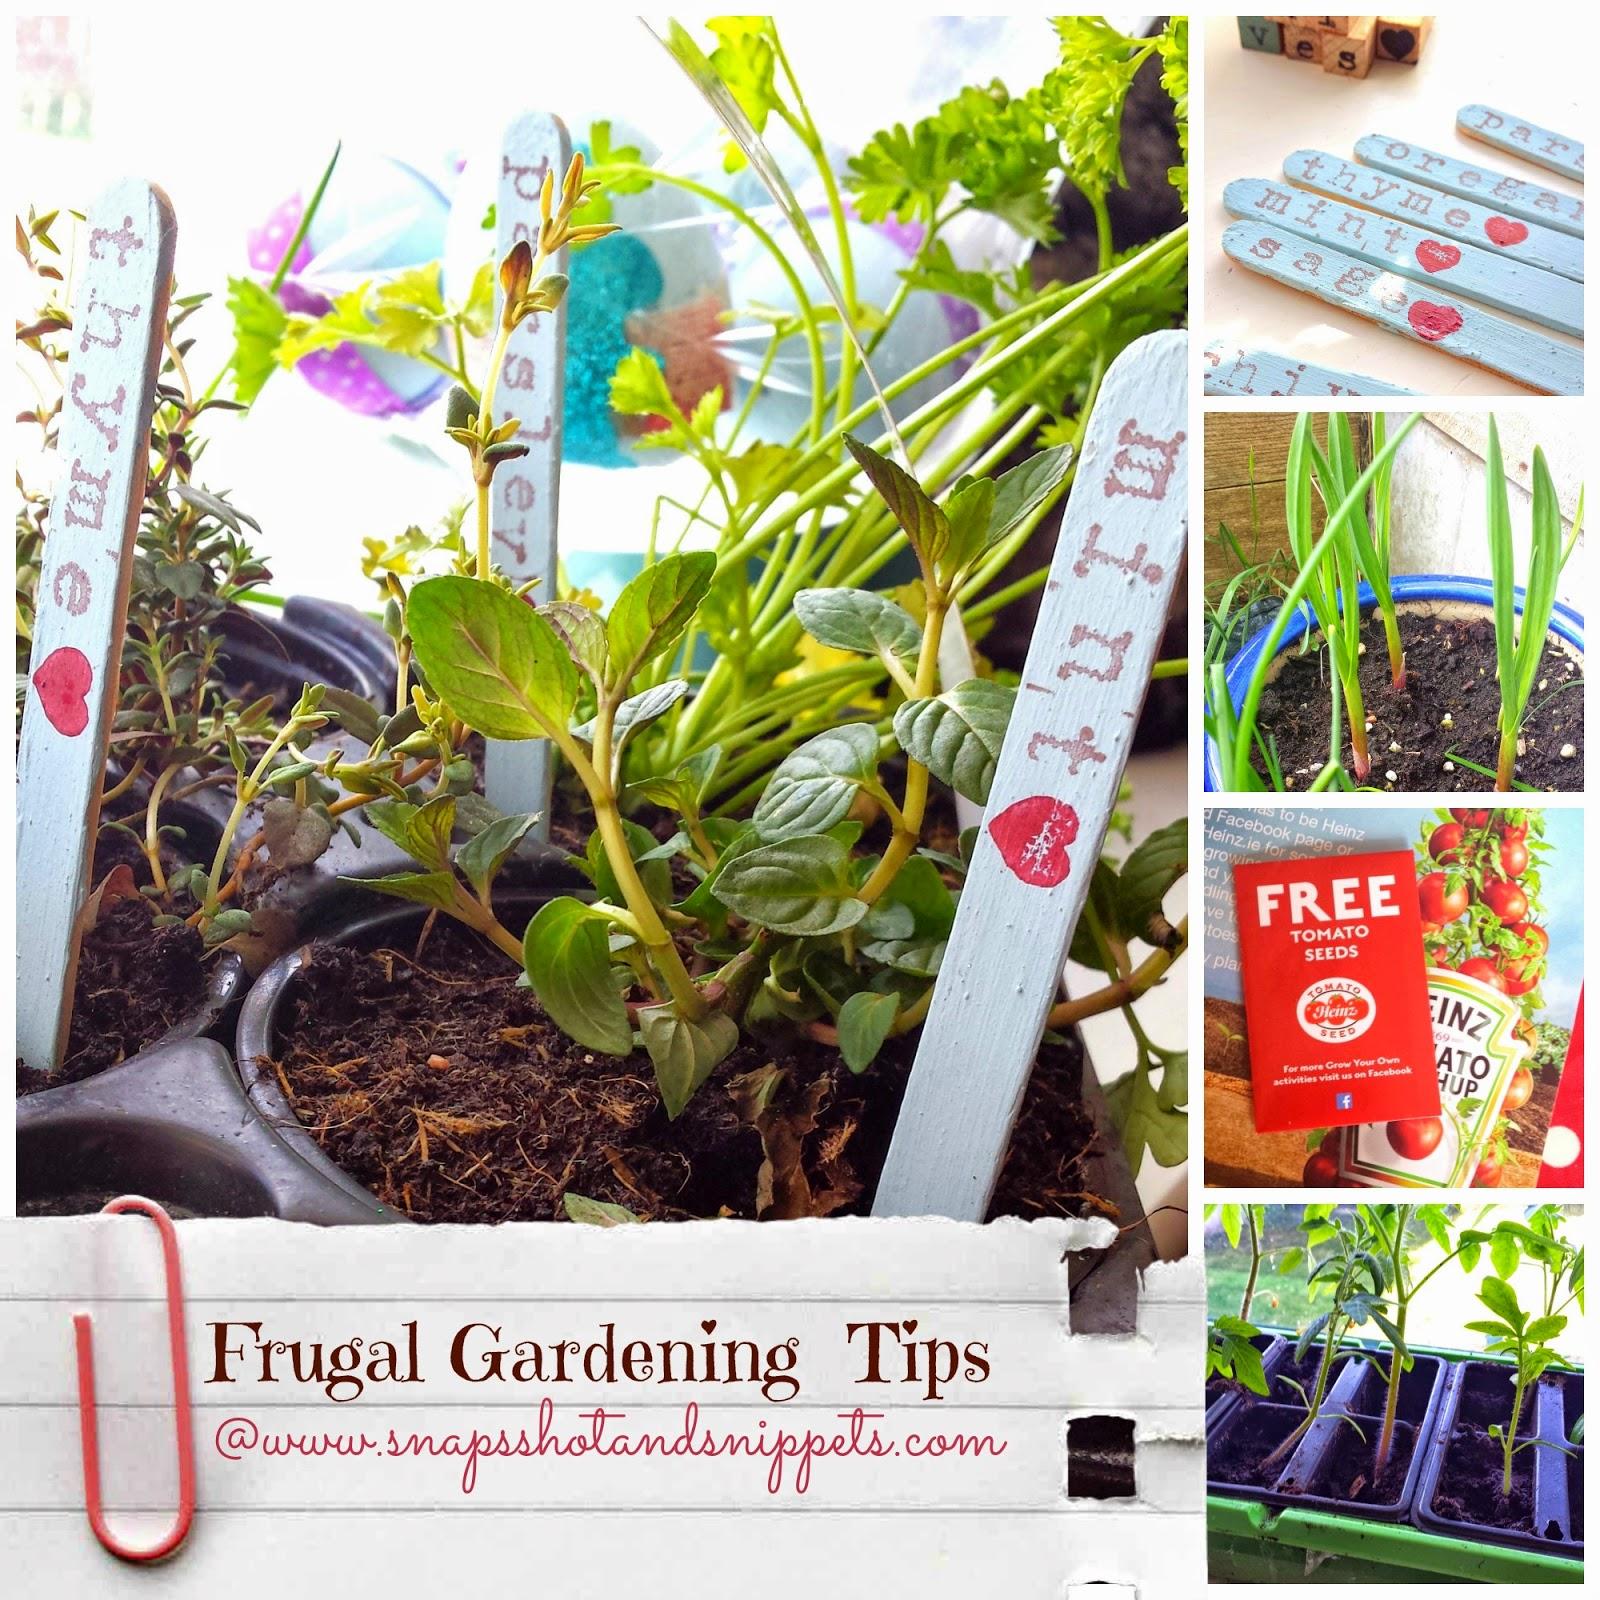 Frugal Gardening